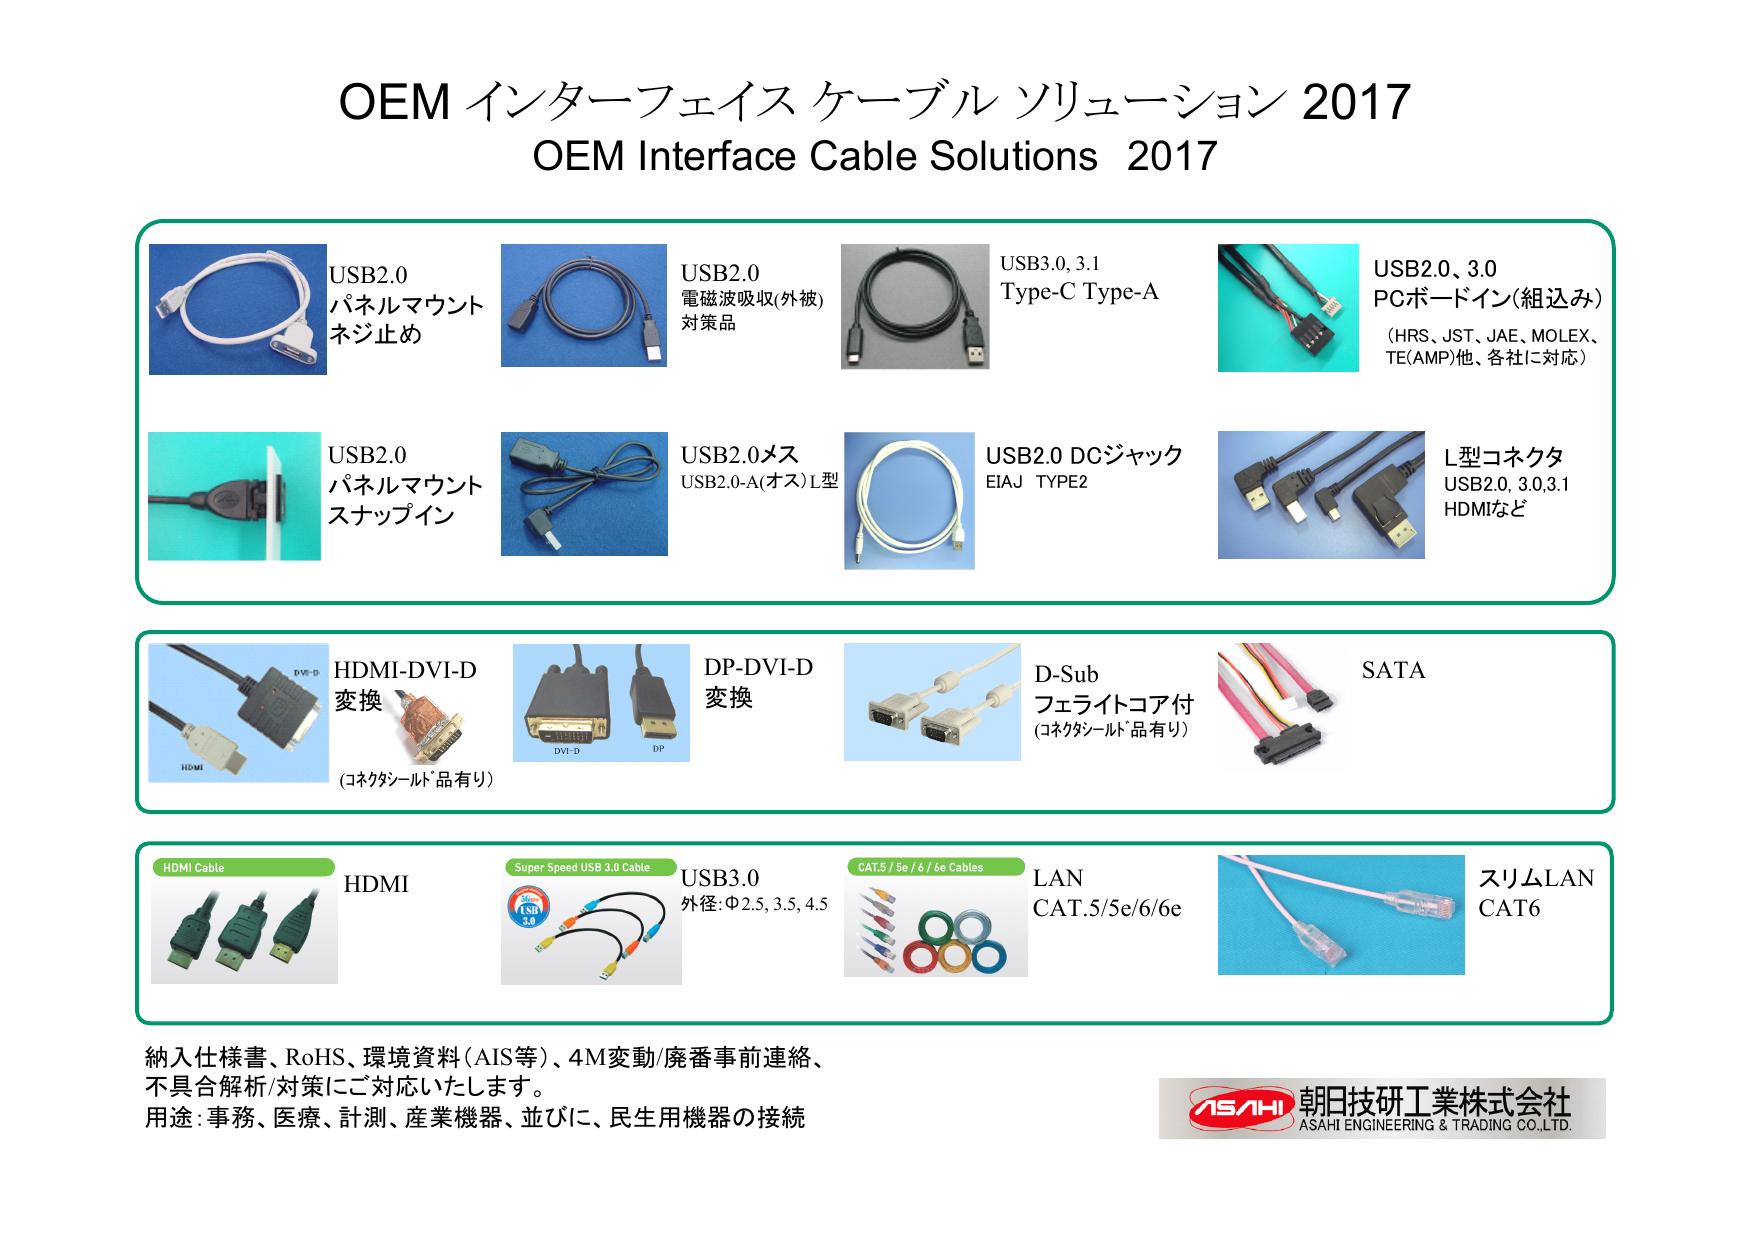 OEMインターフェイスケーブルソリューション2017